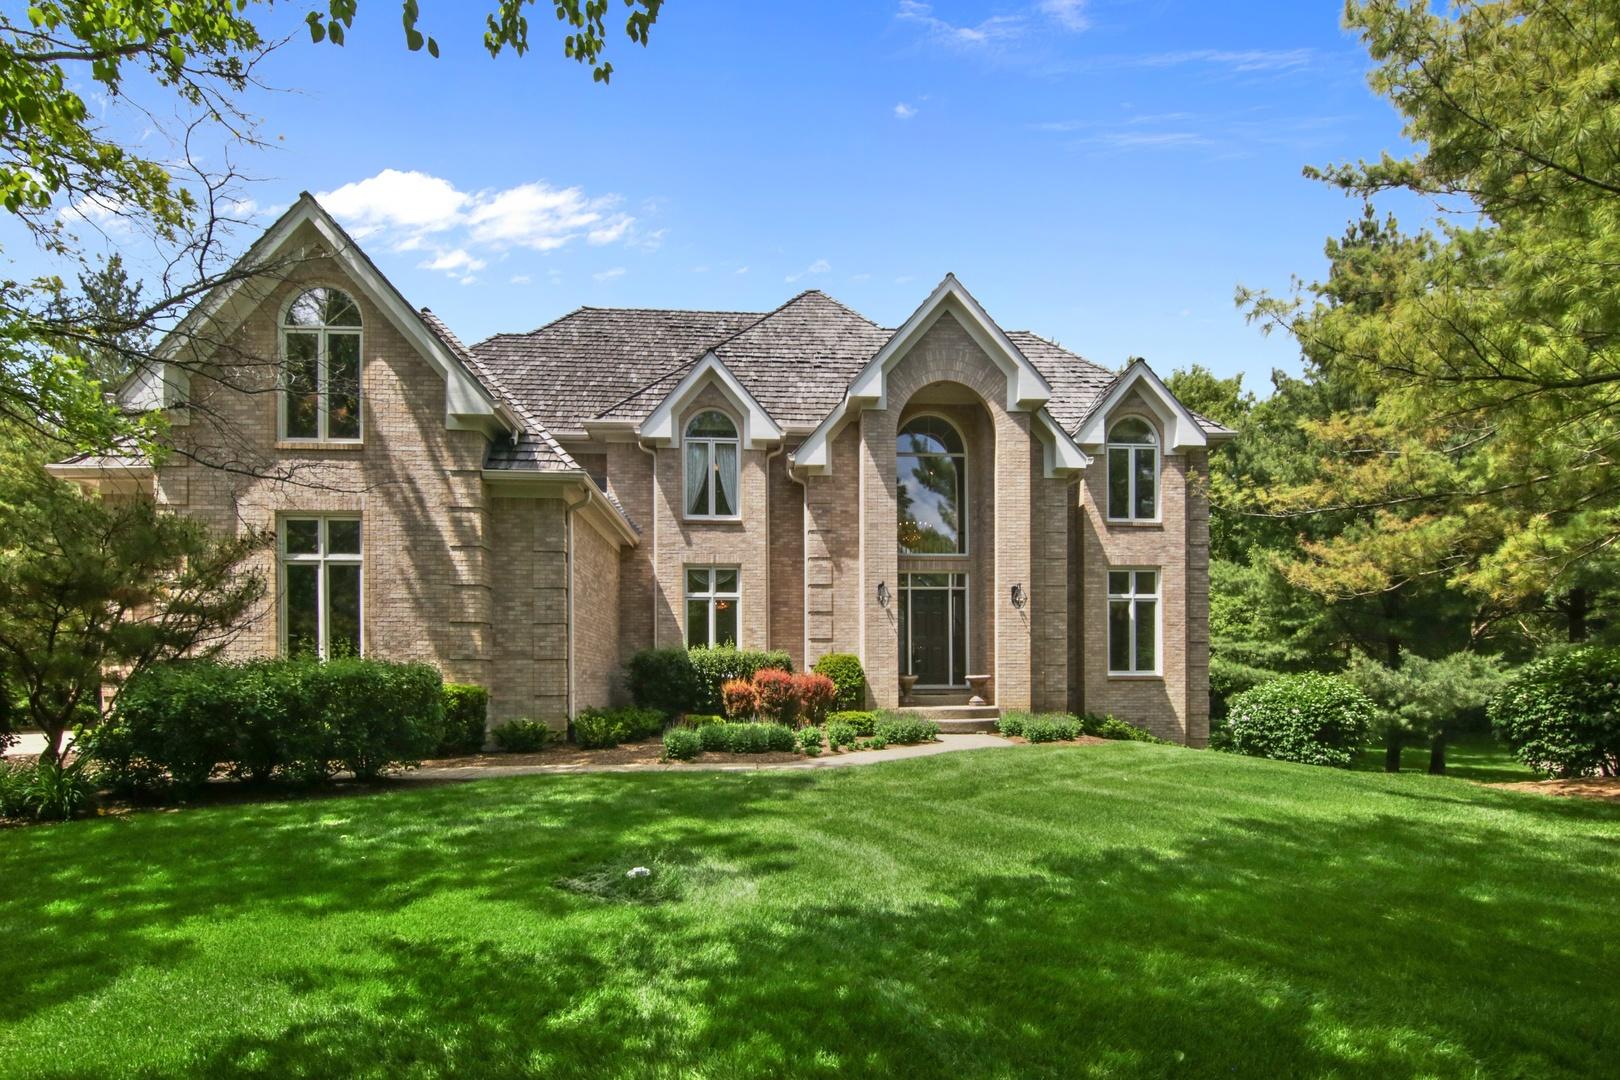 5832 Teal Lane, Long Grove, Illinois 60047